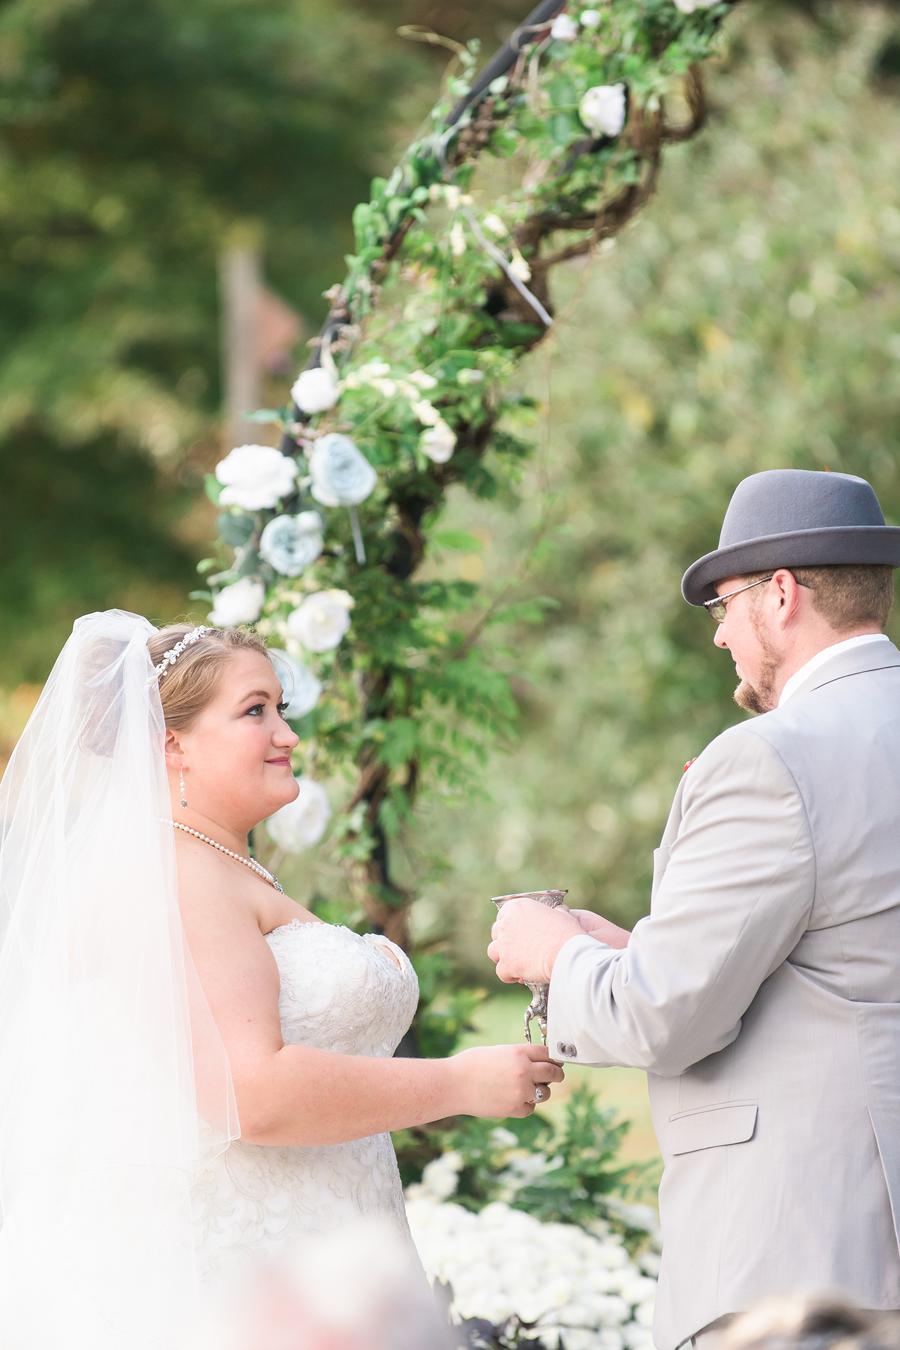 076-0450-kmb_wedding-1299